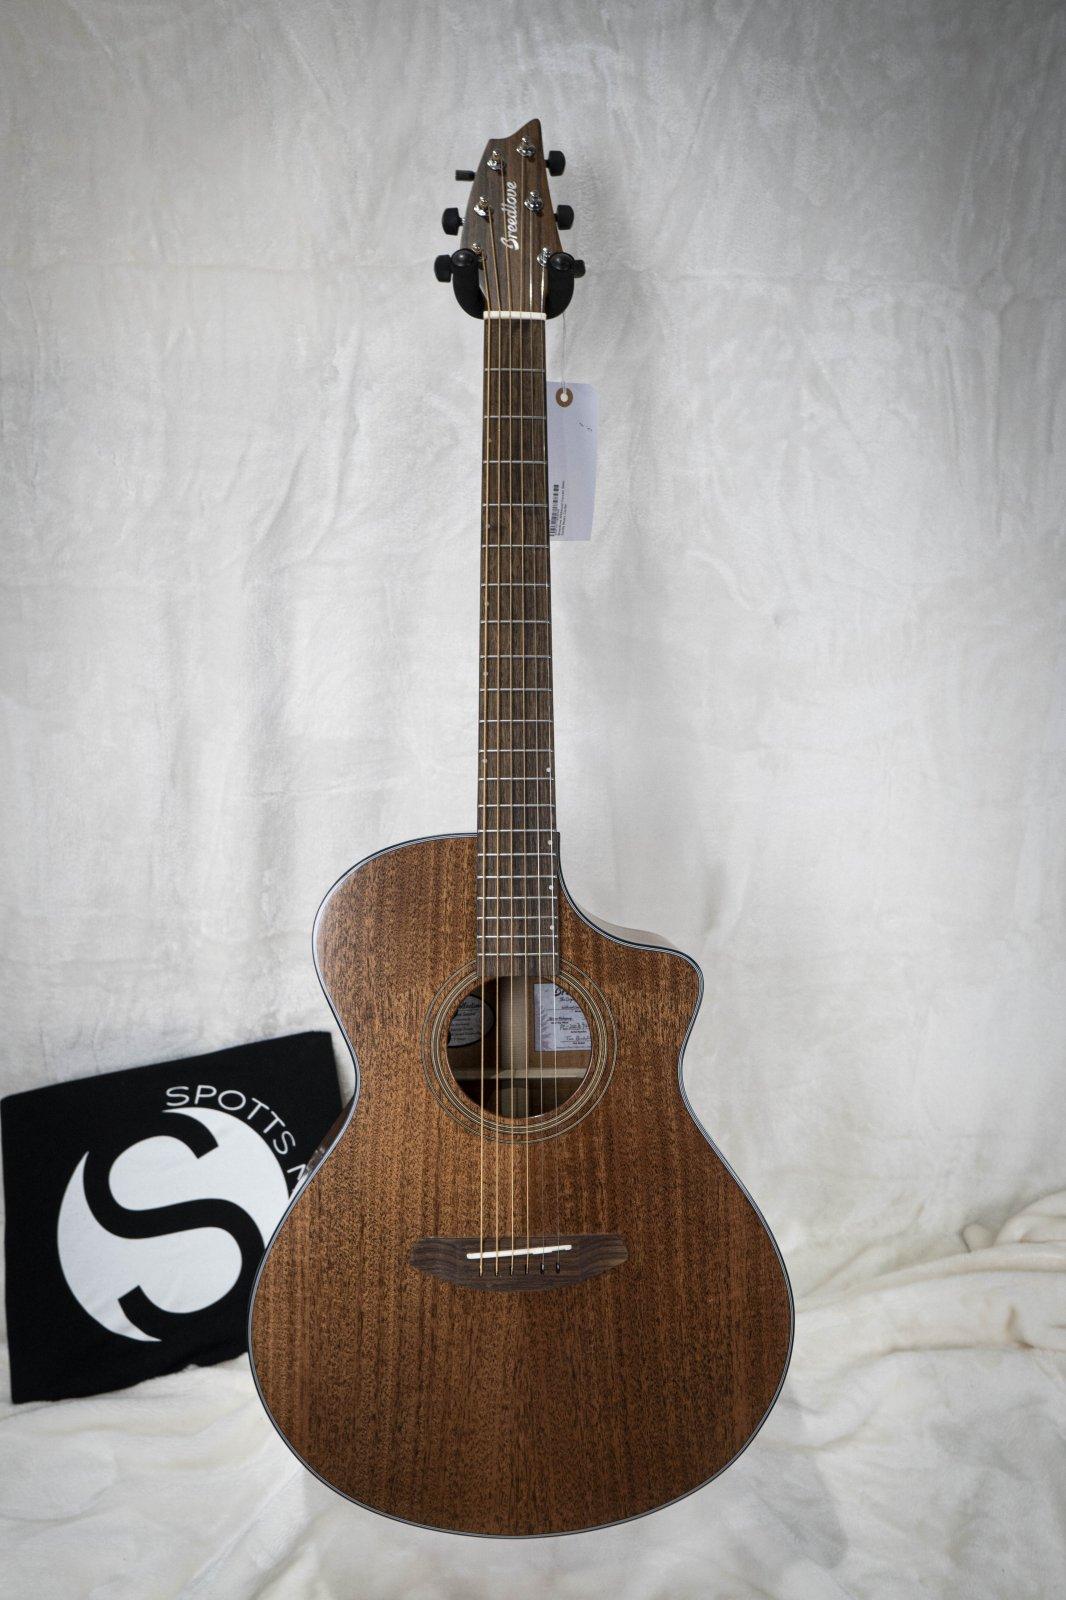 Breedlove Wildwood Concert Satin CE Acoustic Electric Guitar